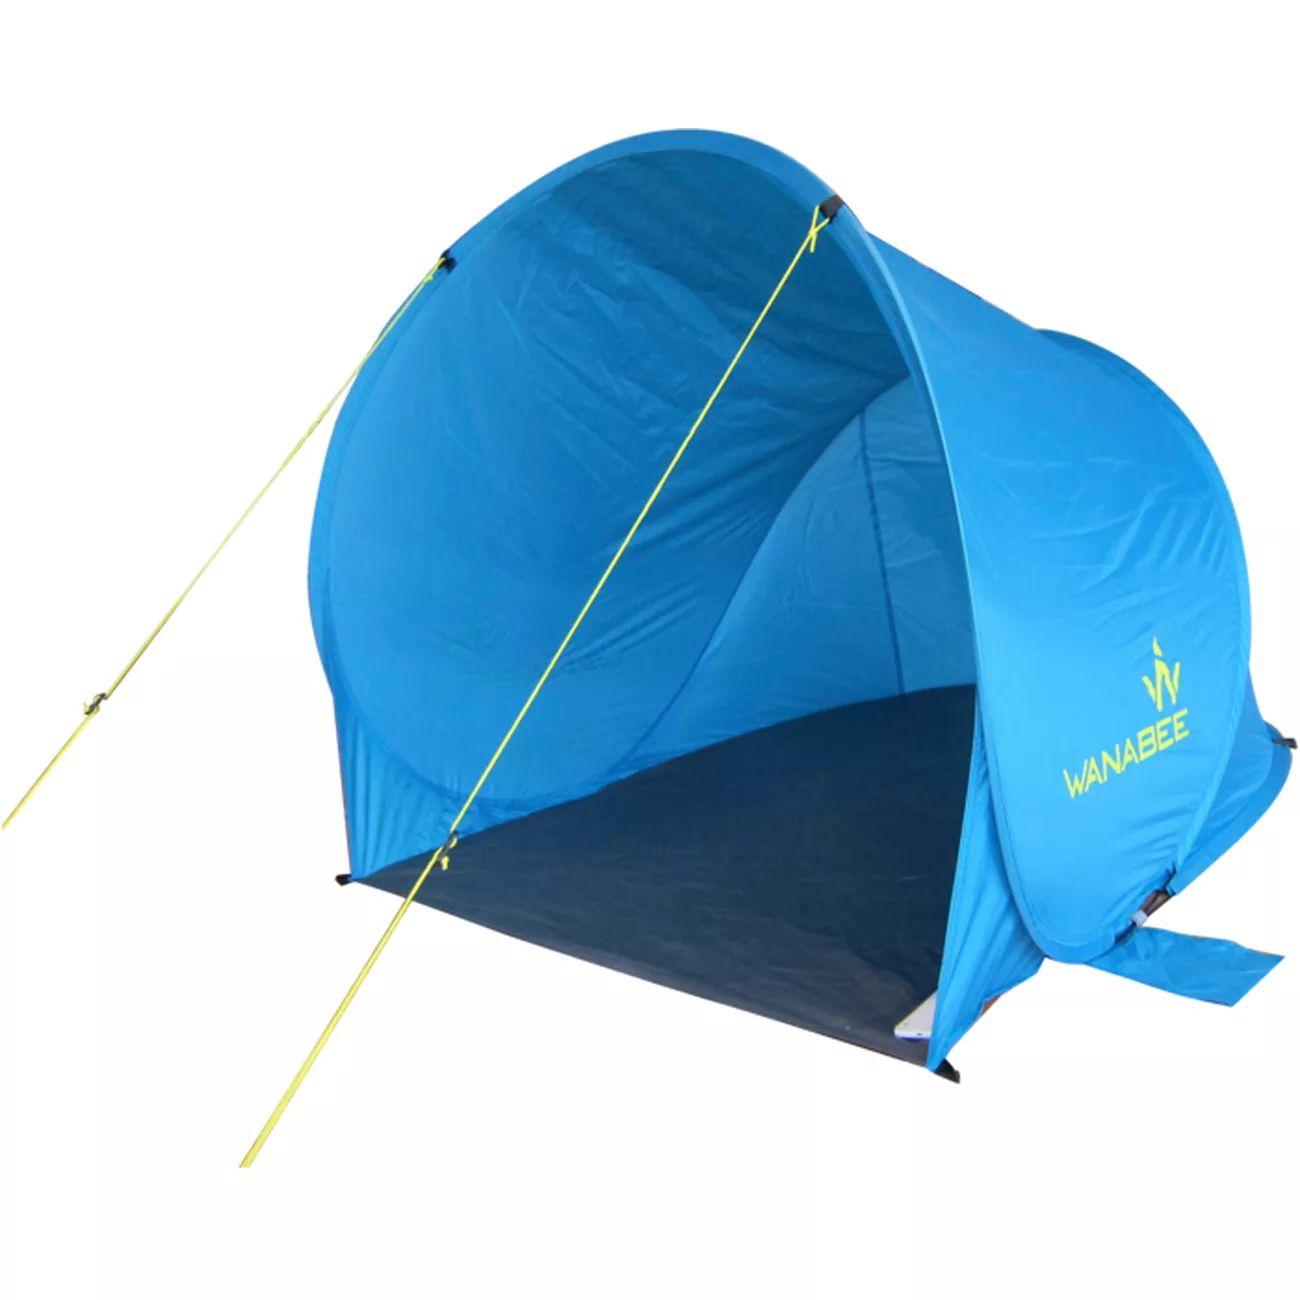 Abri randonnée Wanabee Instent BB XL - anti UV 50+